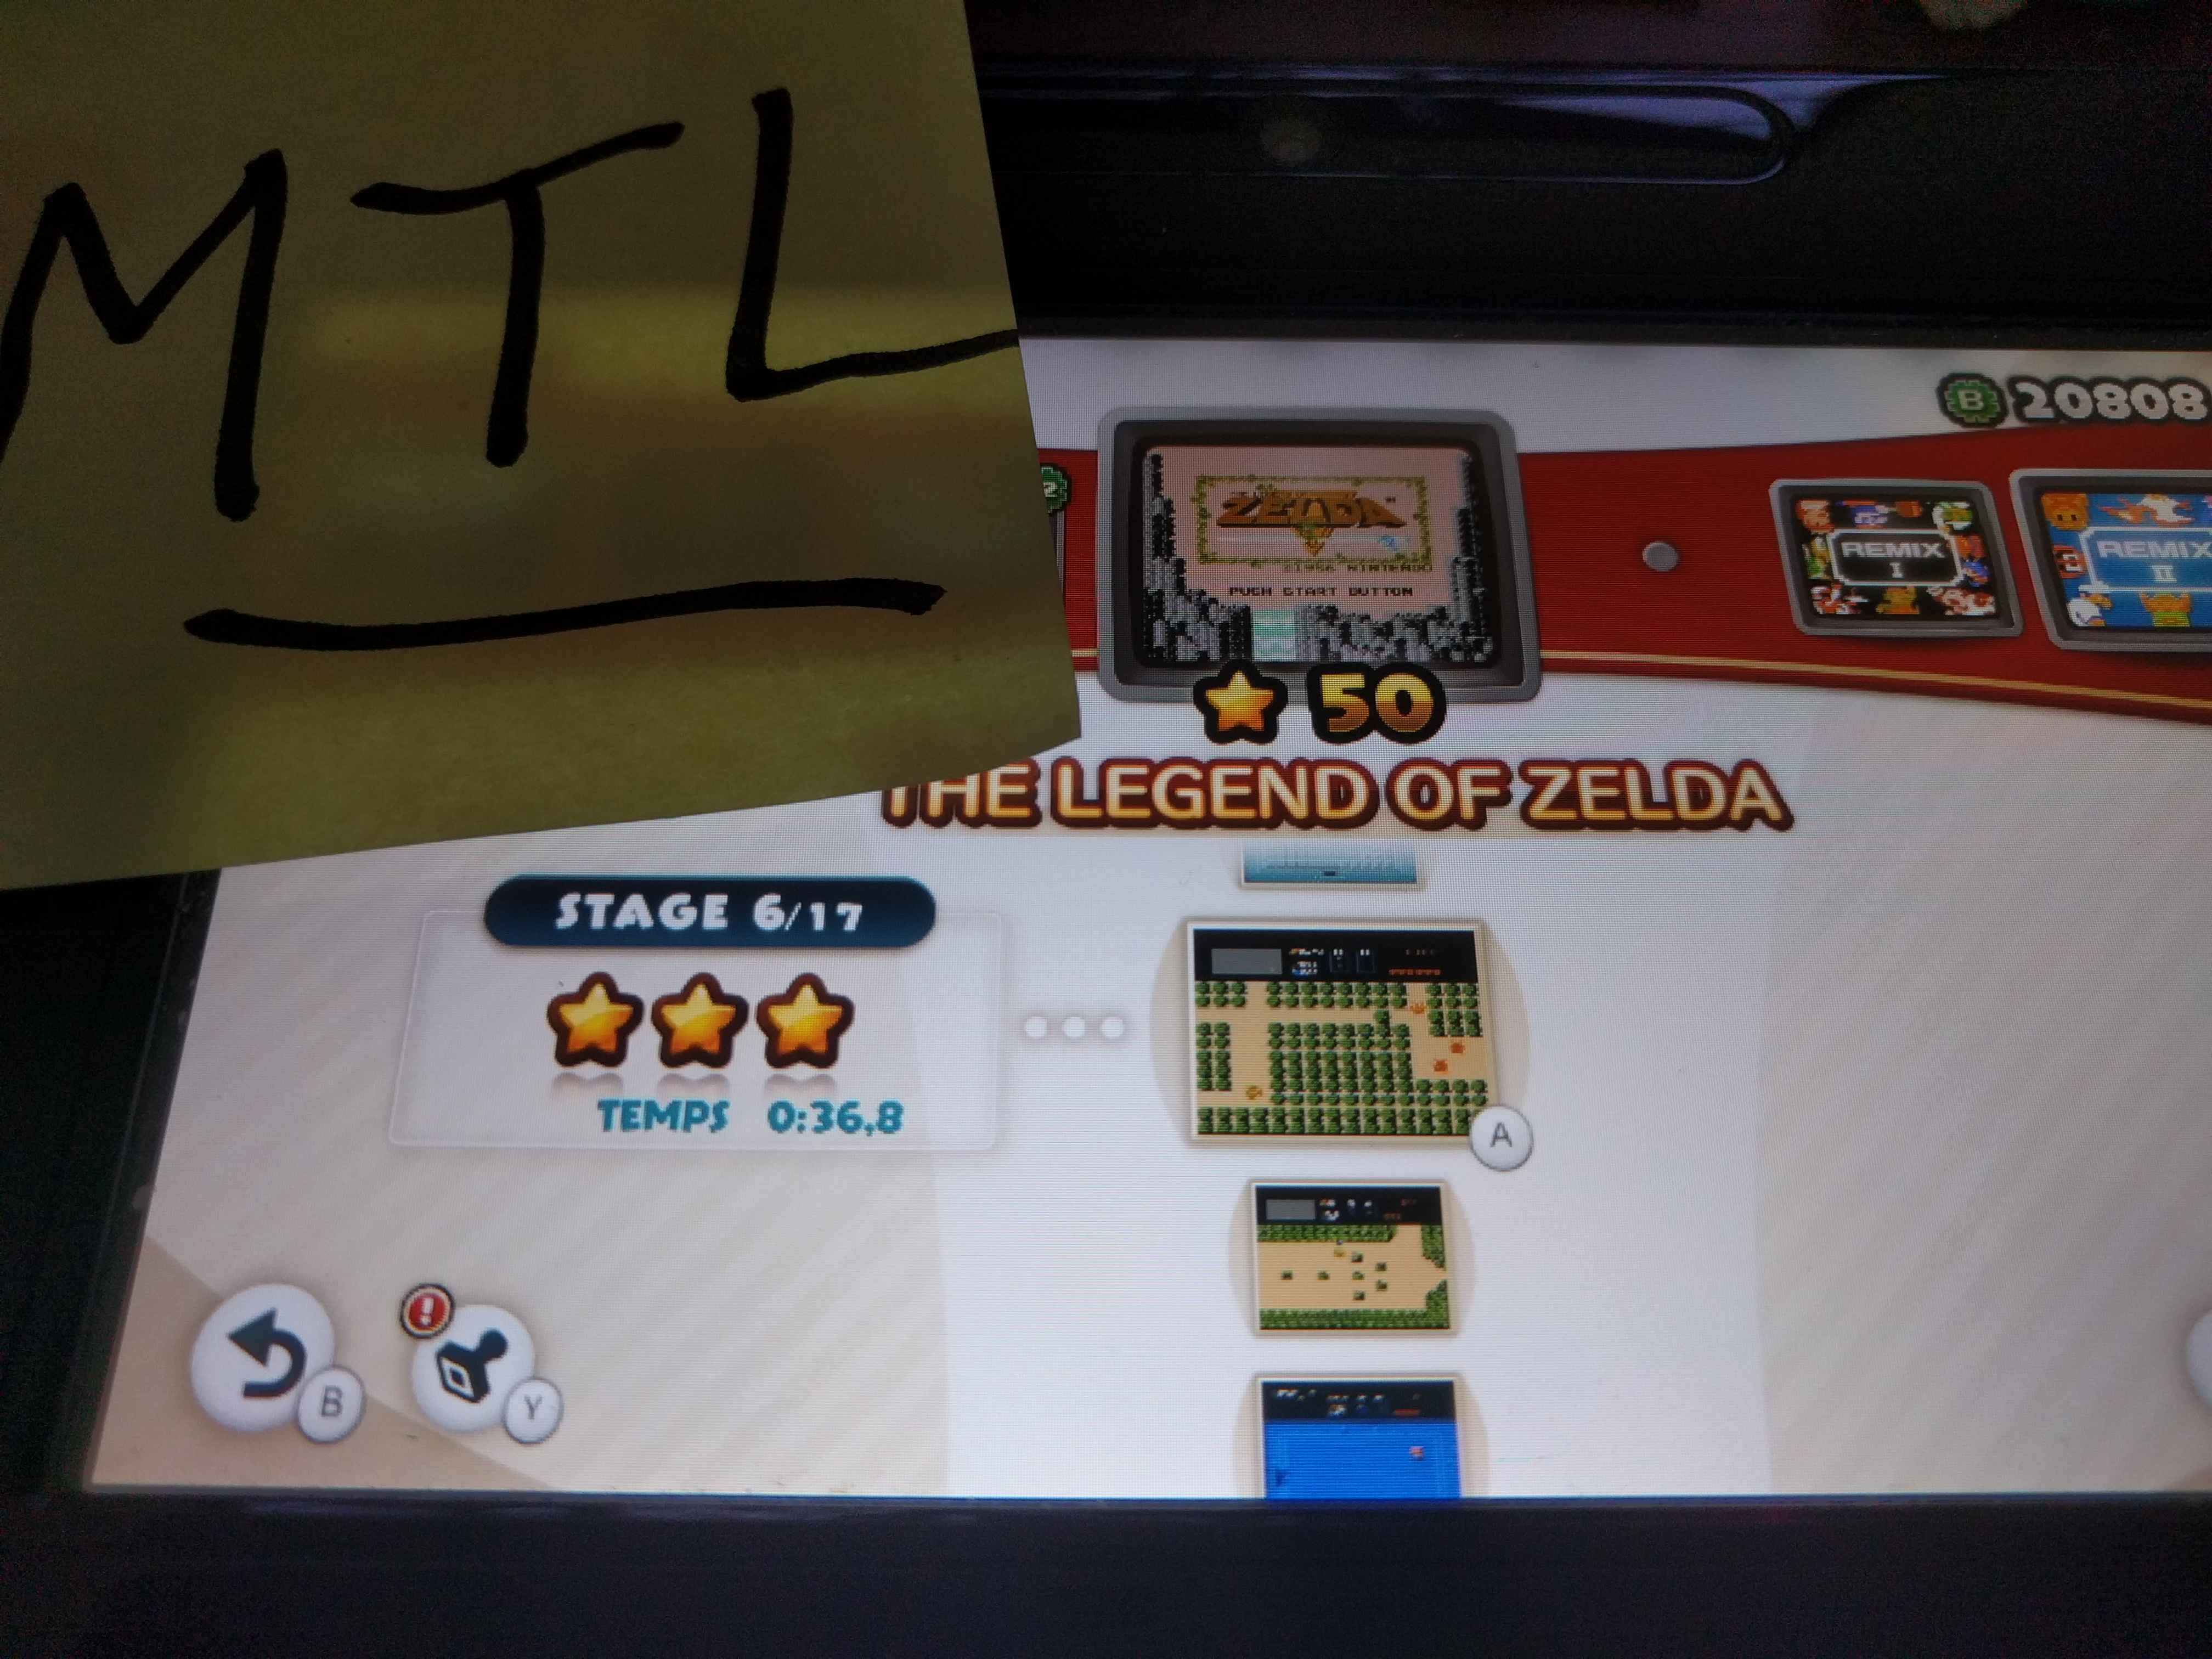 Mantalow: NES Remix: The Legend of Zelda: Stage 6 (Wii U) 0:00:36.8 points on 2016-06-11 03:04:22